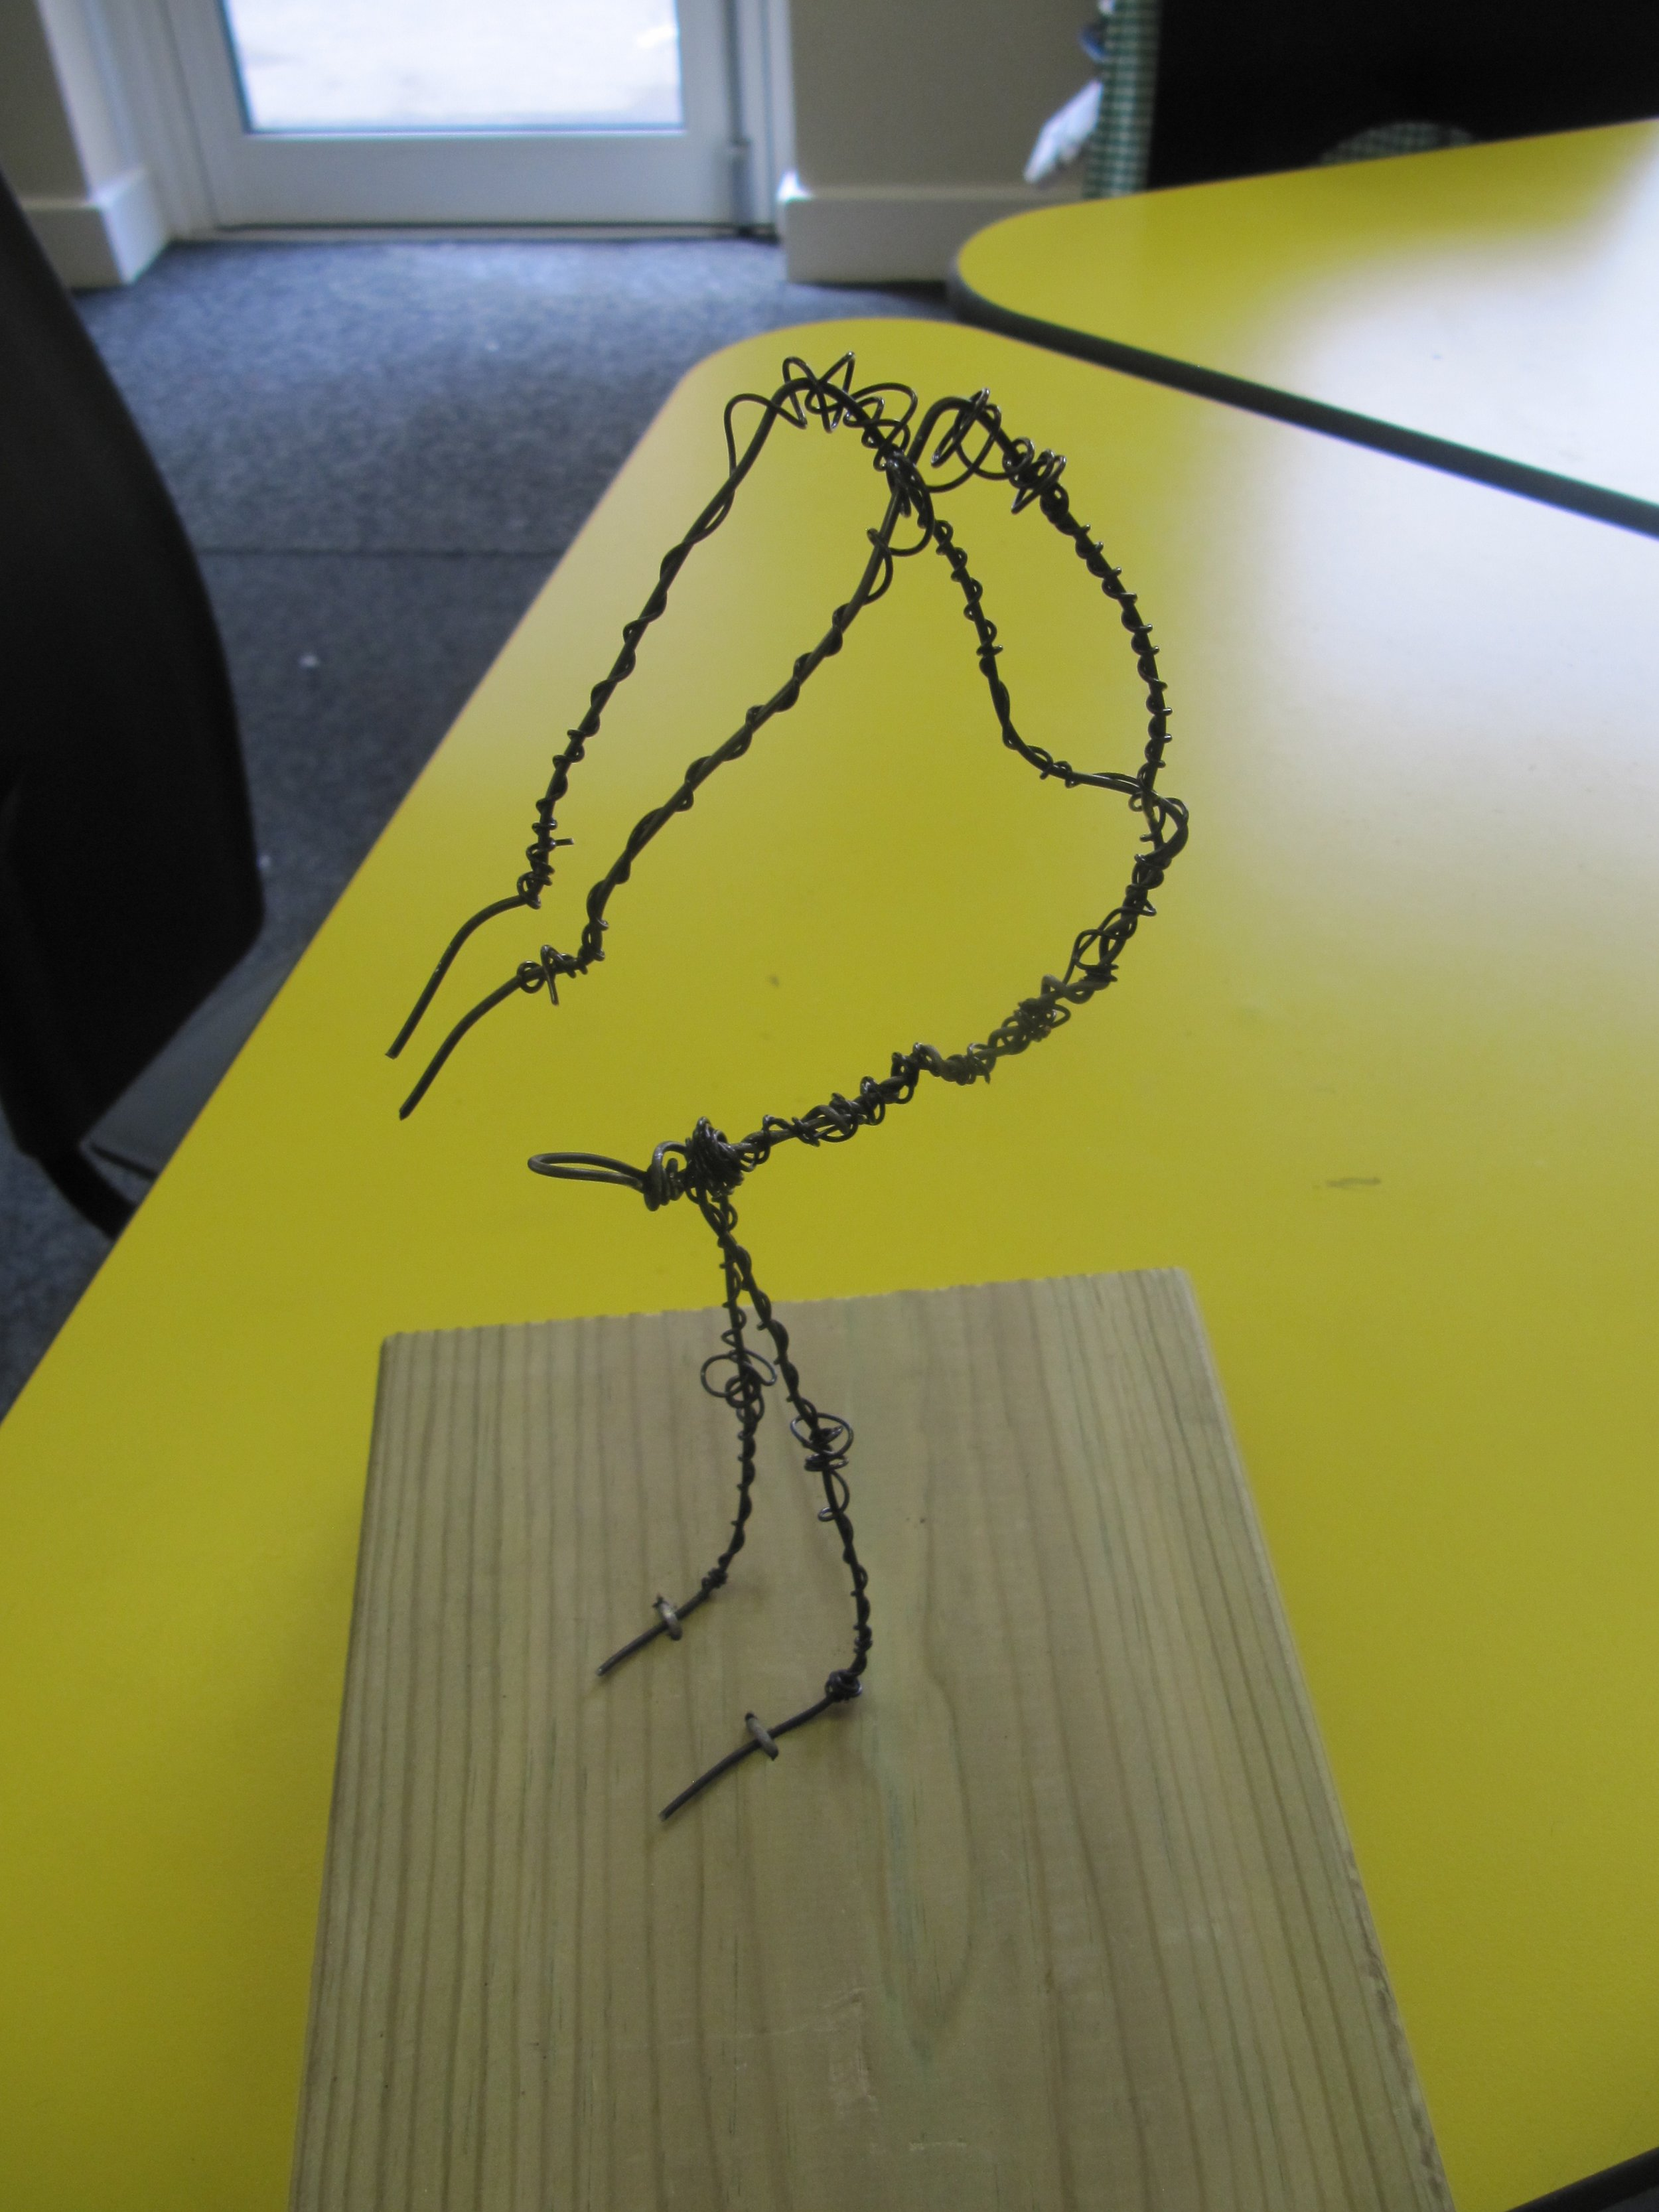 Giacometti-inspired figure